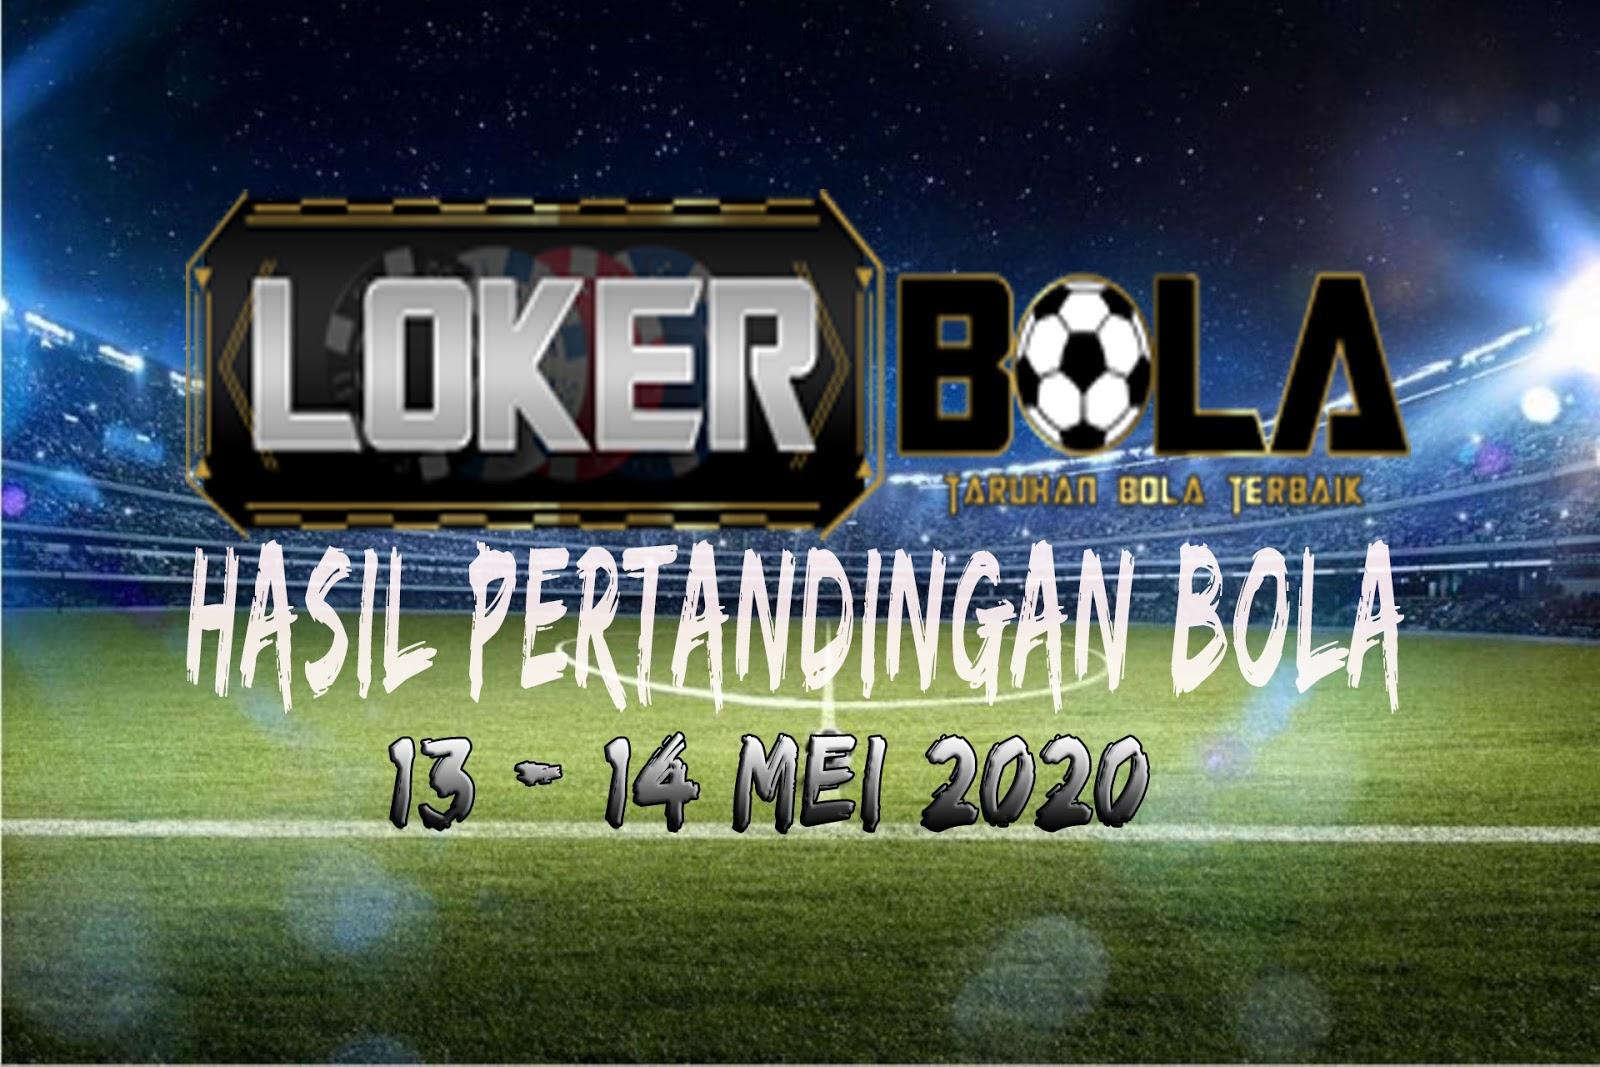 HASIL PERTANDINGAN BOLA 13 – 14 May 2020